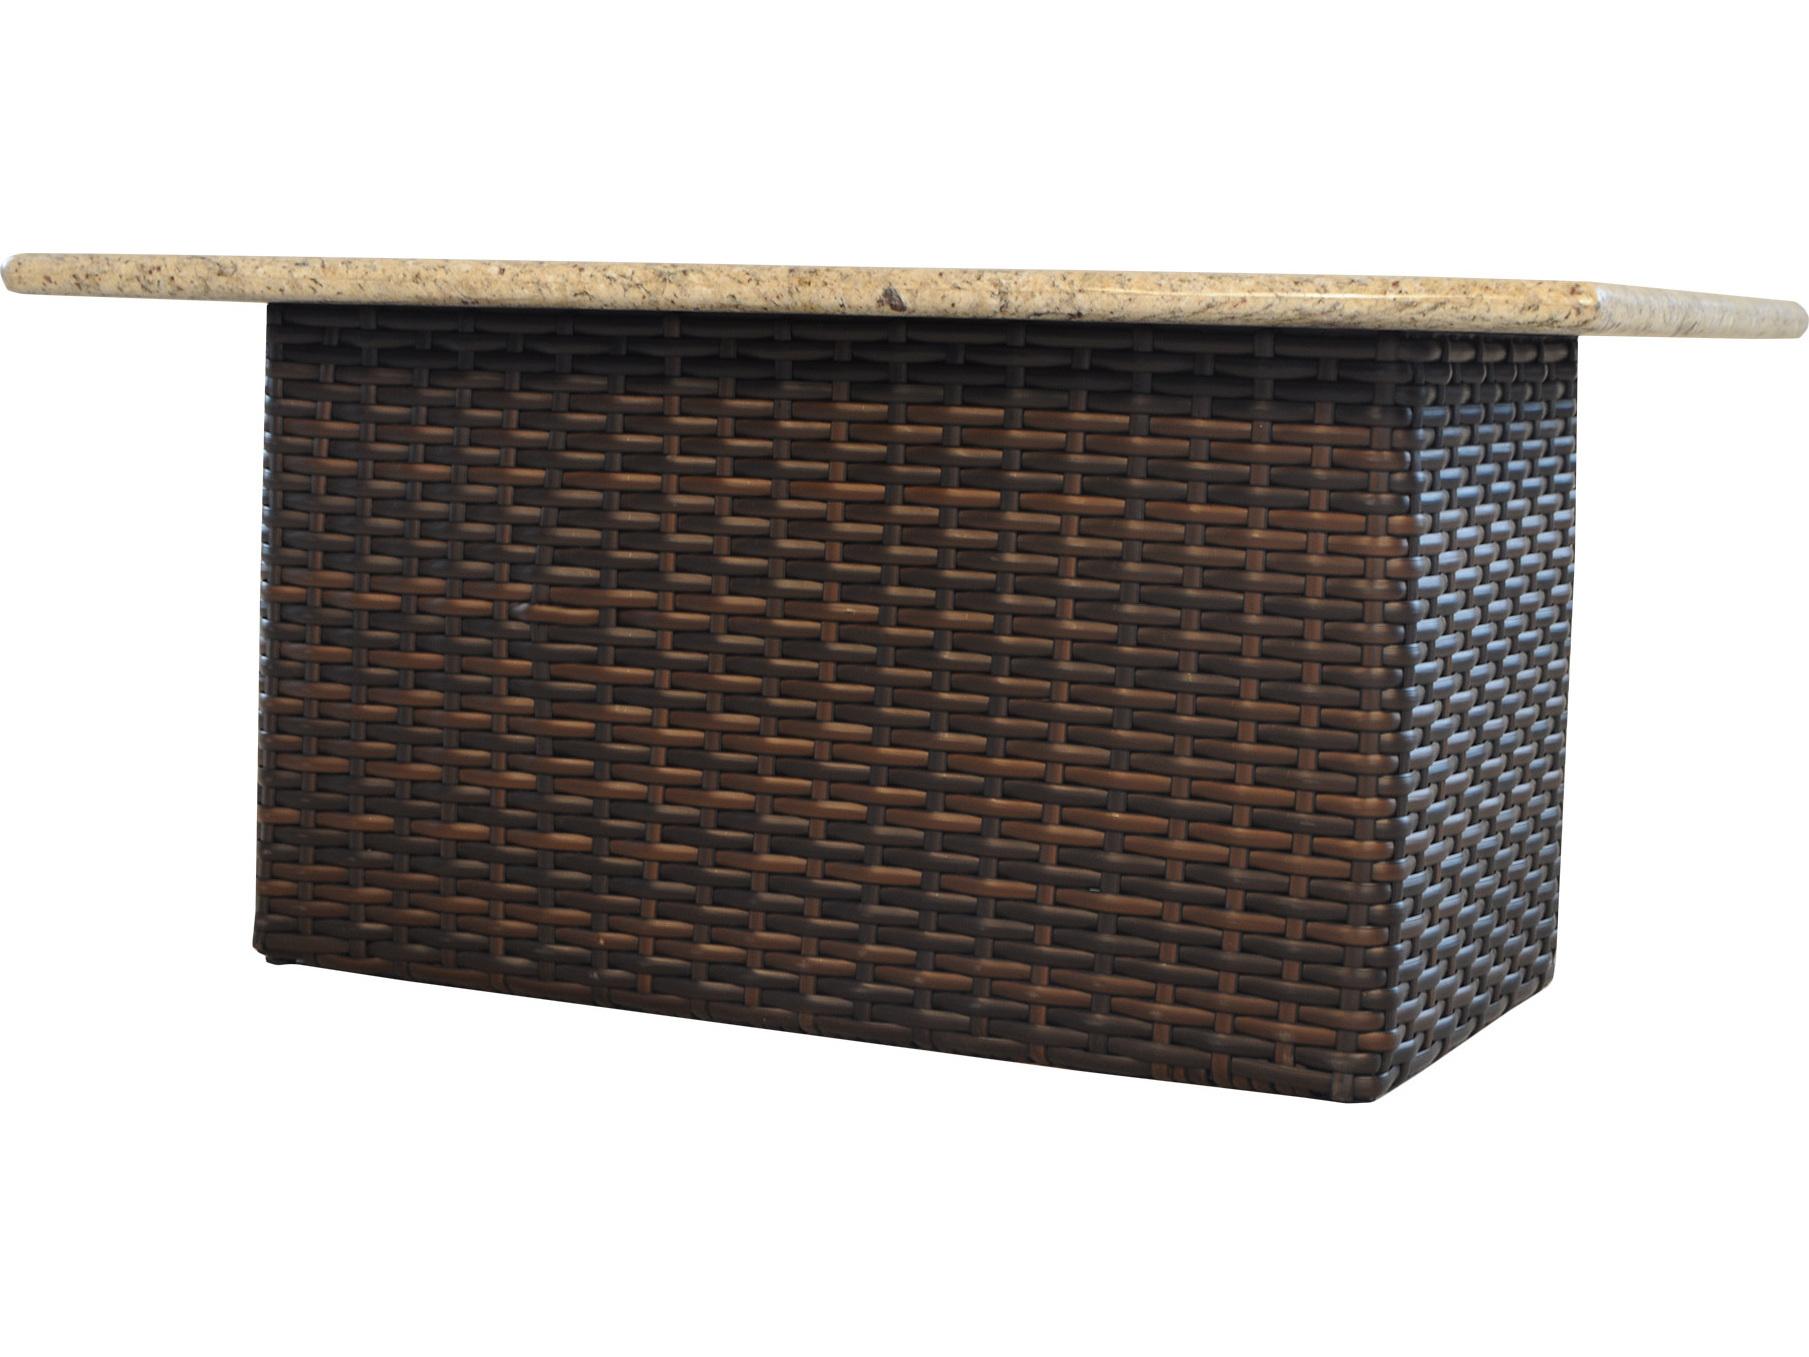 Lloyd flanders contempo wicker 52 39 39 x 32 39 39 rectangular for Rectangular stone fire pit